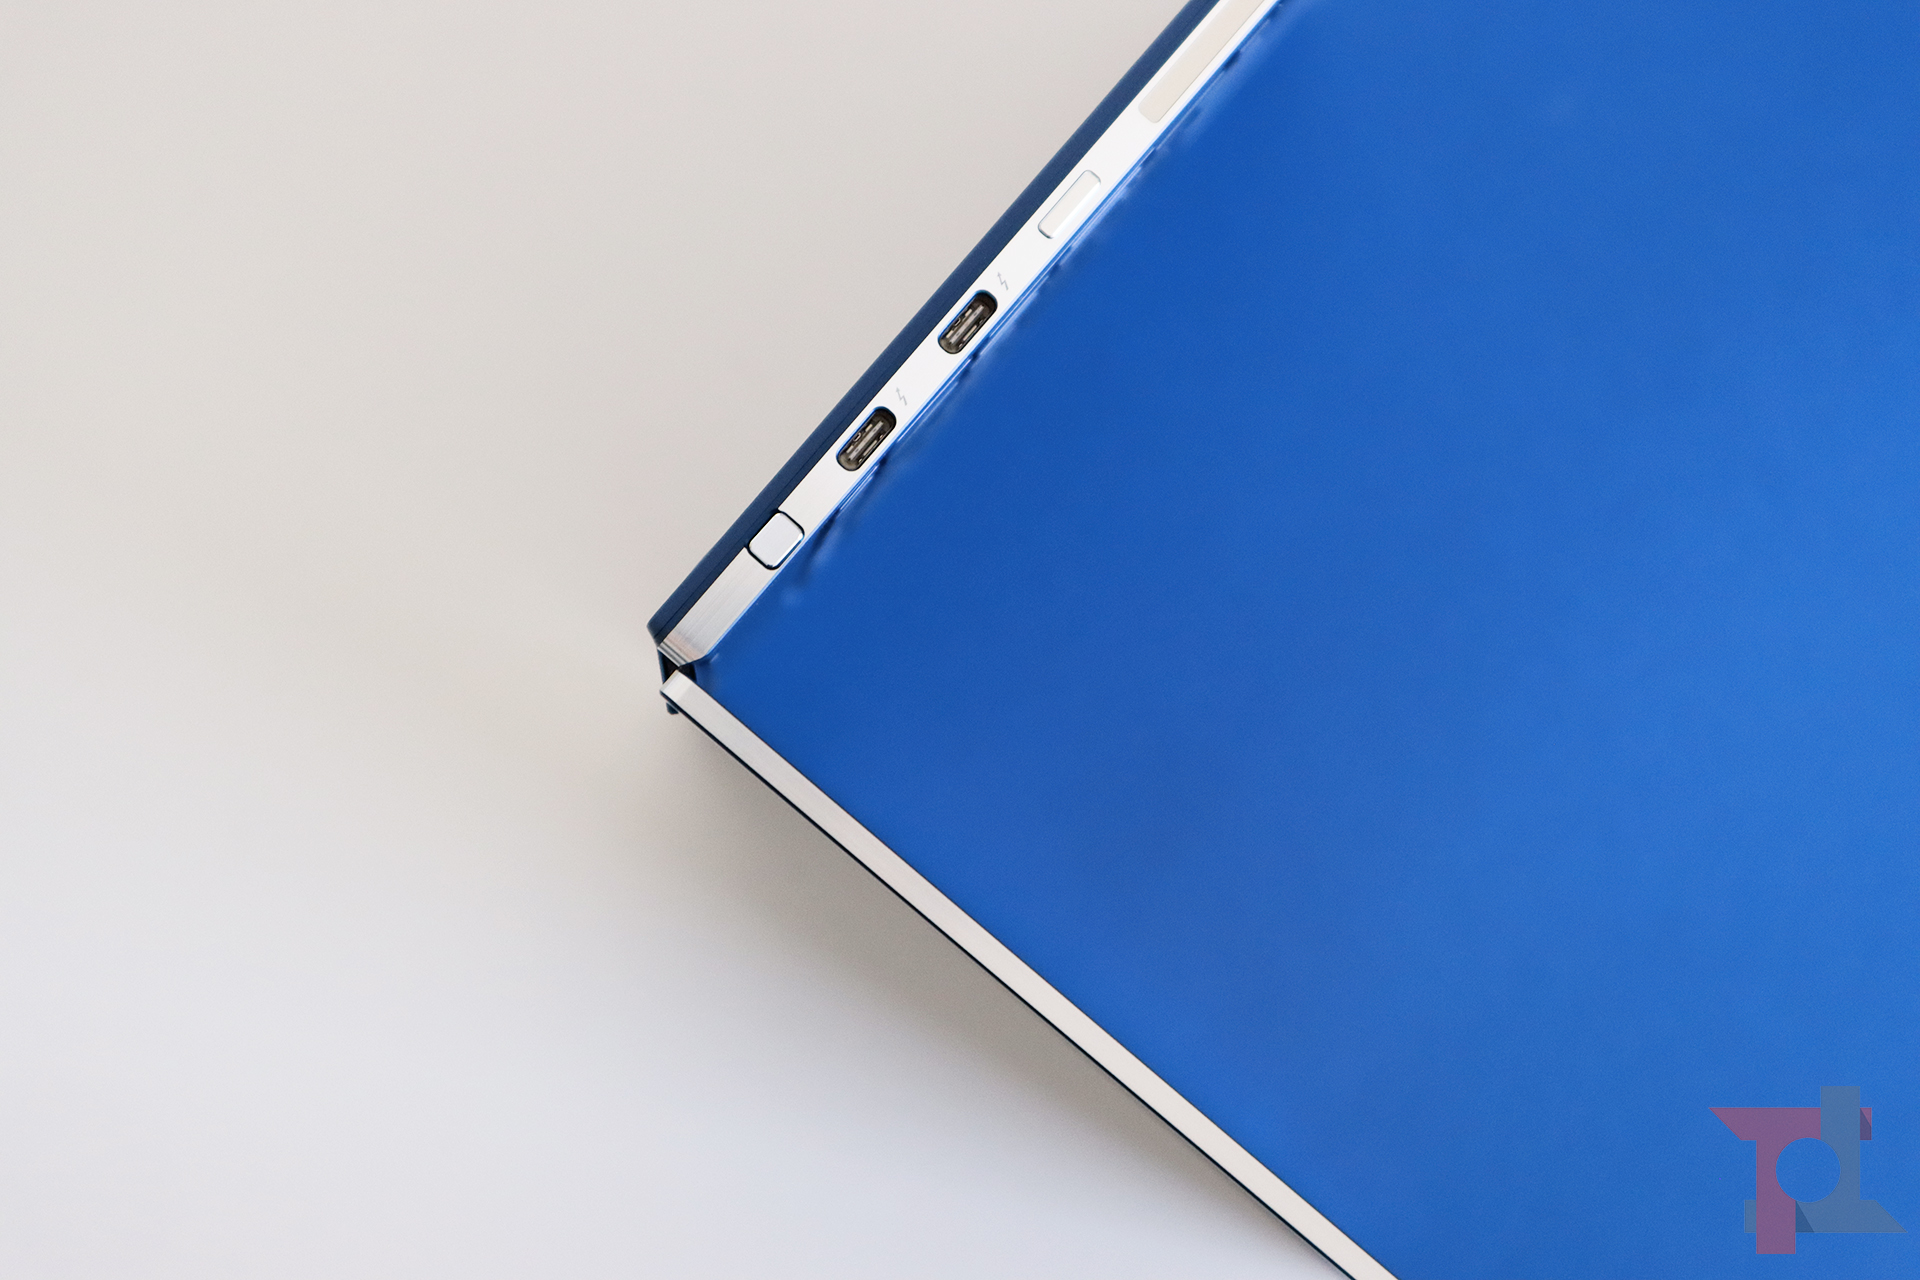 Samsung Galaxy Book Flex scheda tecnica